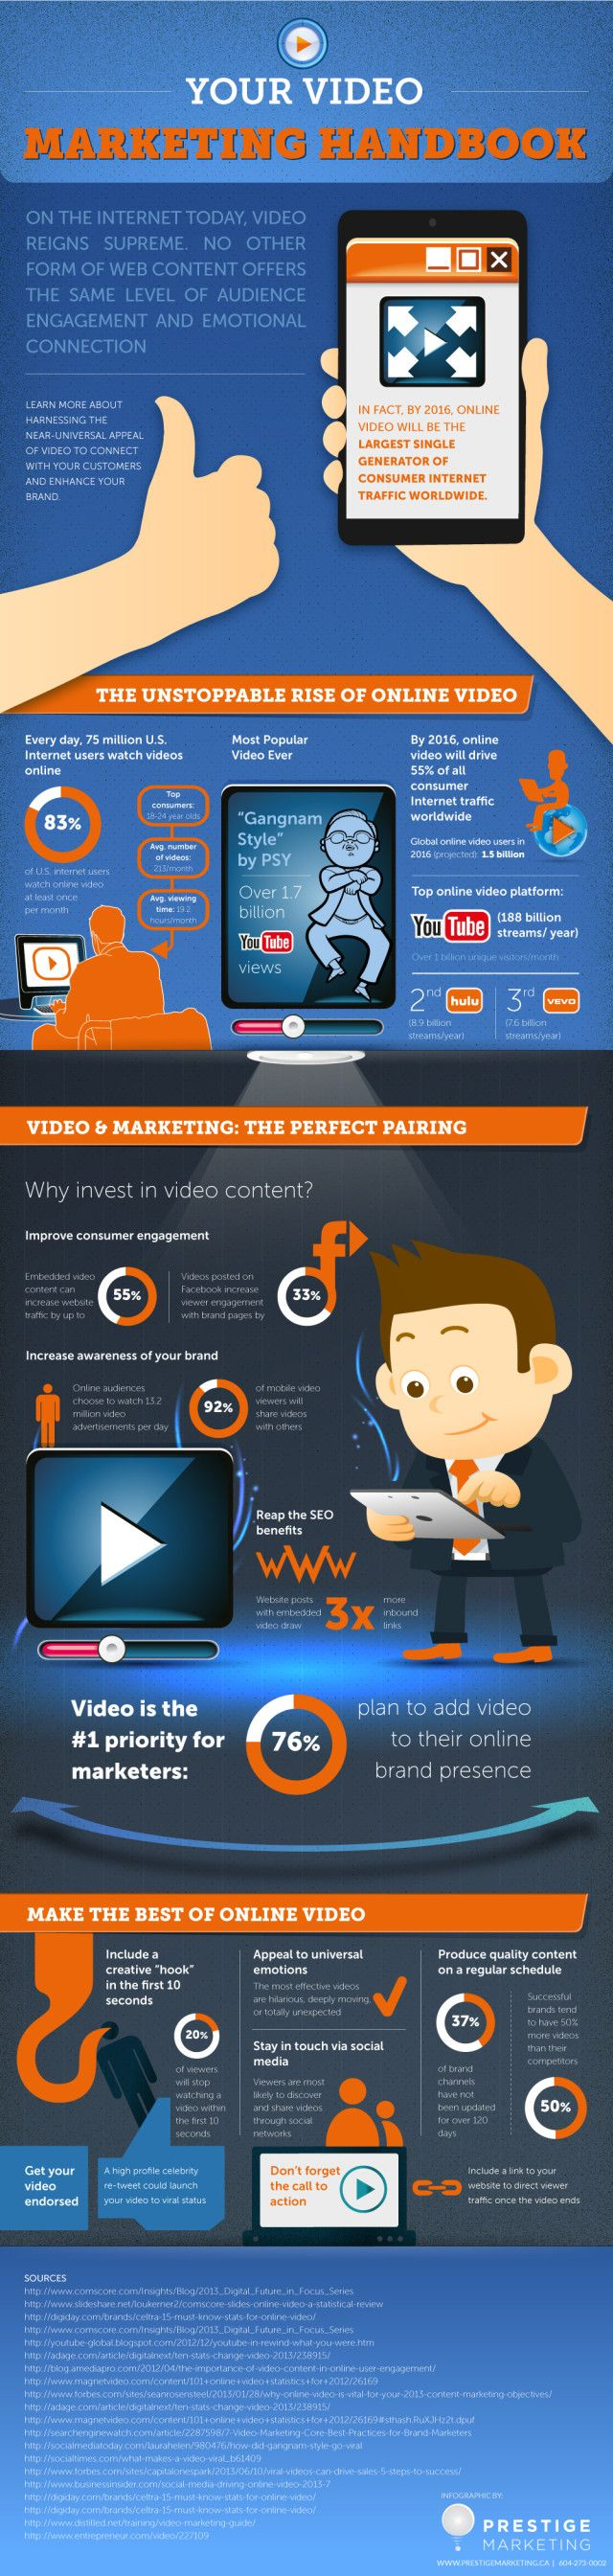 Your #Video #Marketing Handbook